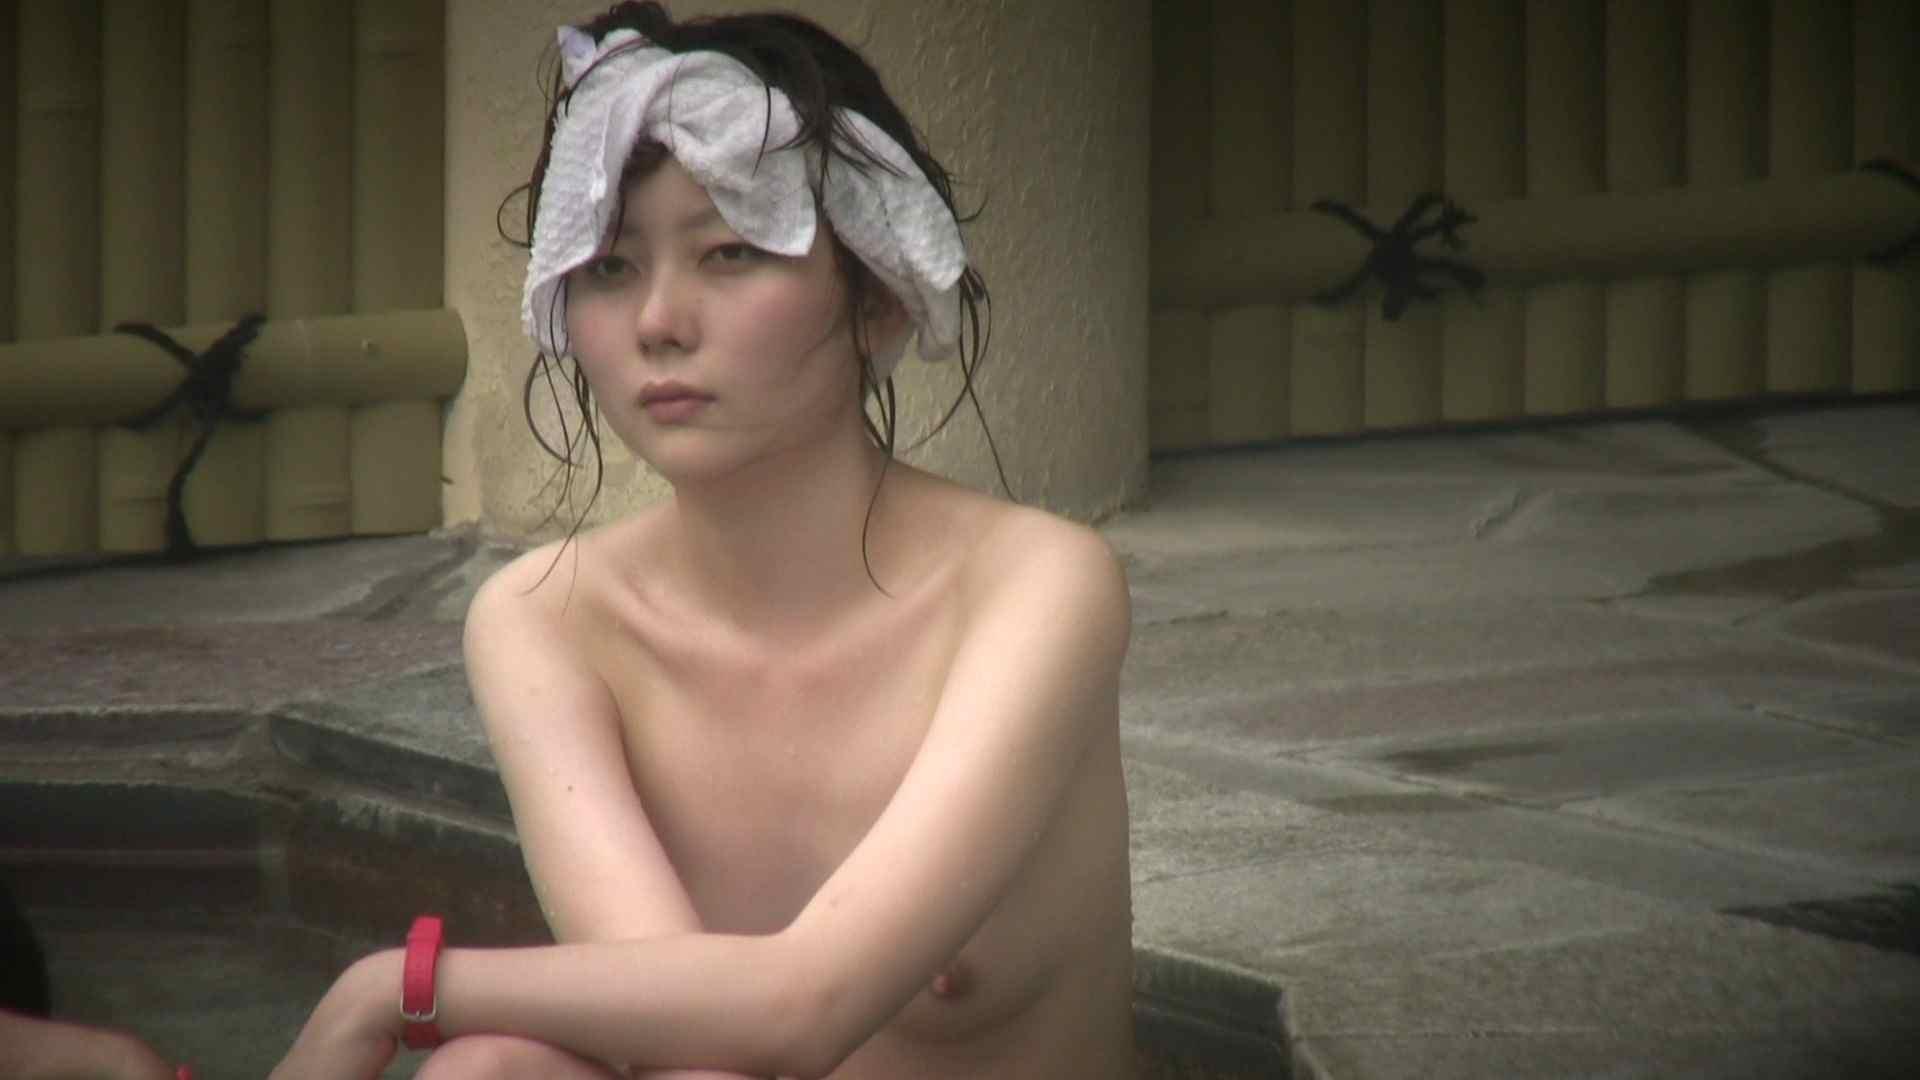 Aquaな露天風呂Vol.147 露天 濡れ場動画紹介 85画像 80